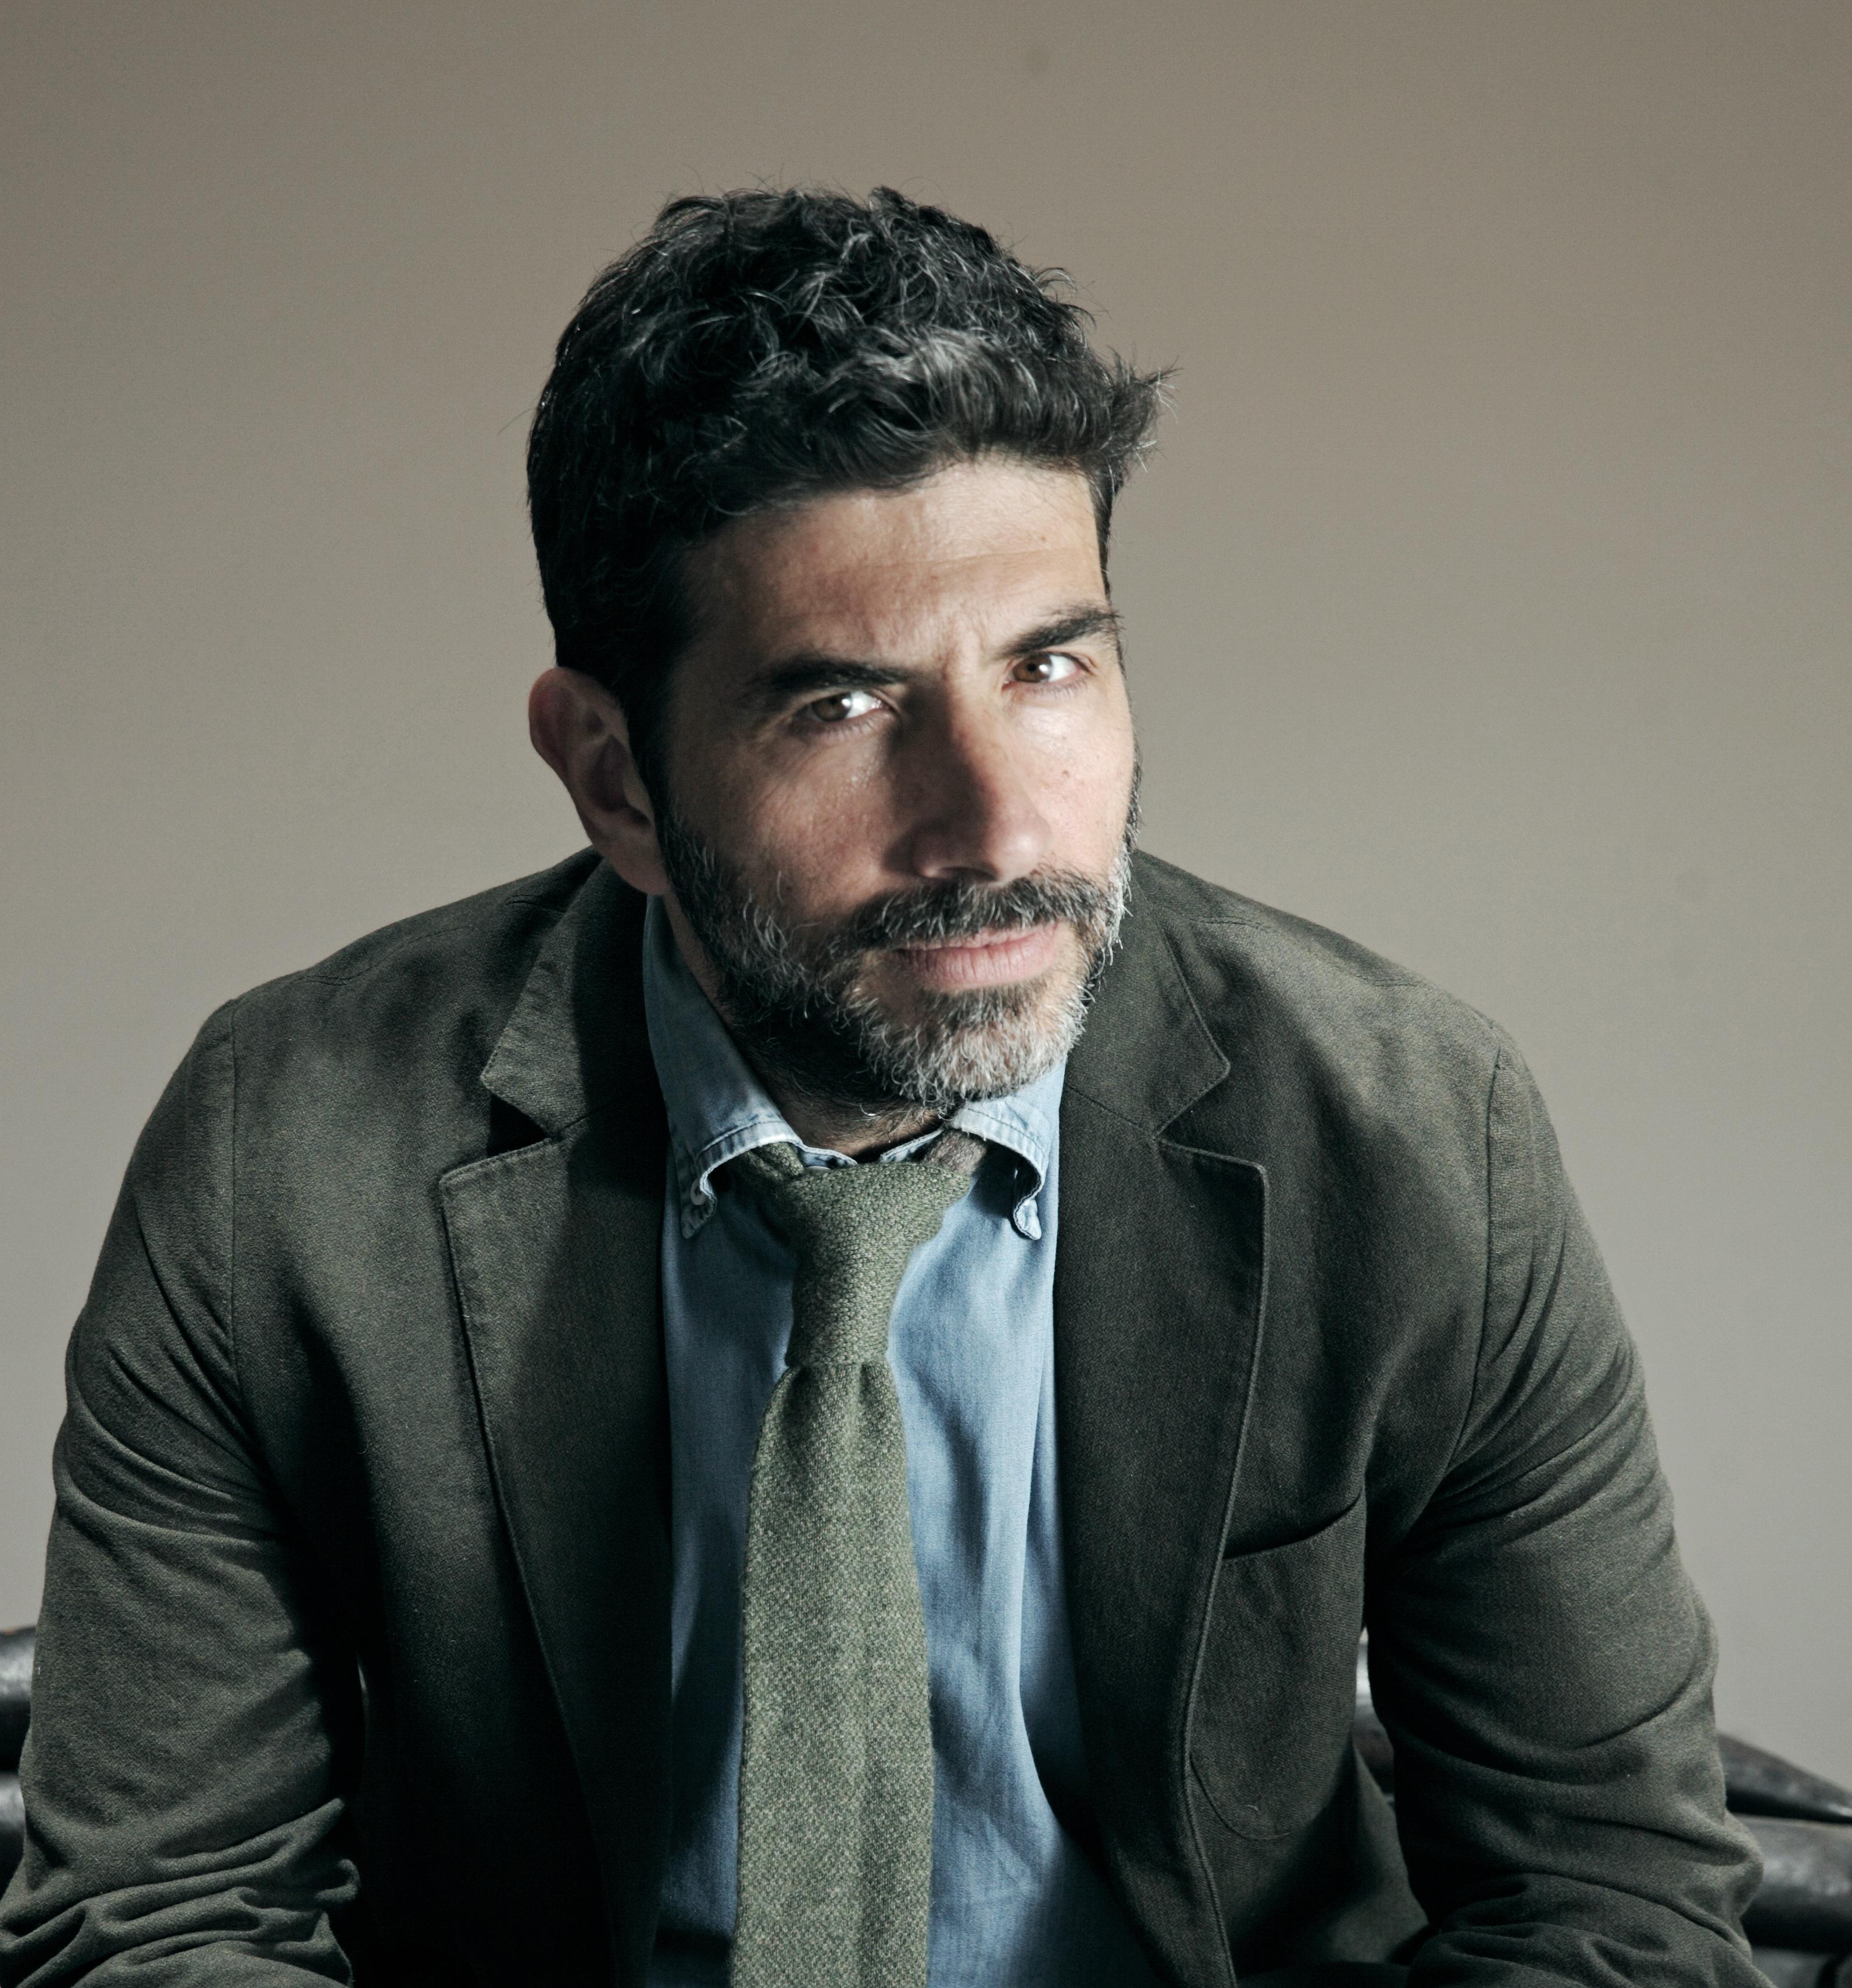 CLAUDIO CASTROGIOVANNI BY Fabio Lovino